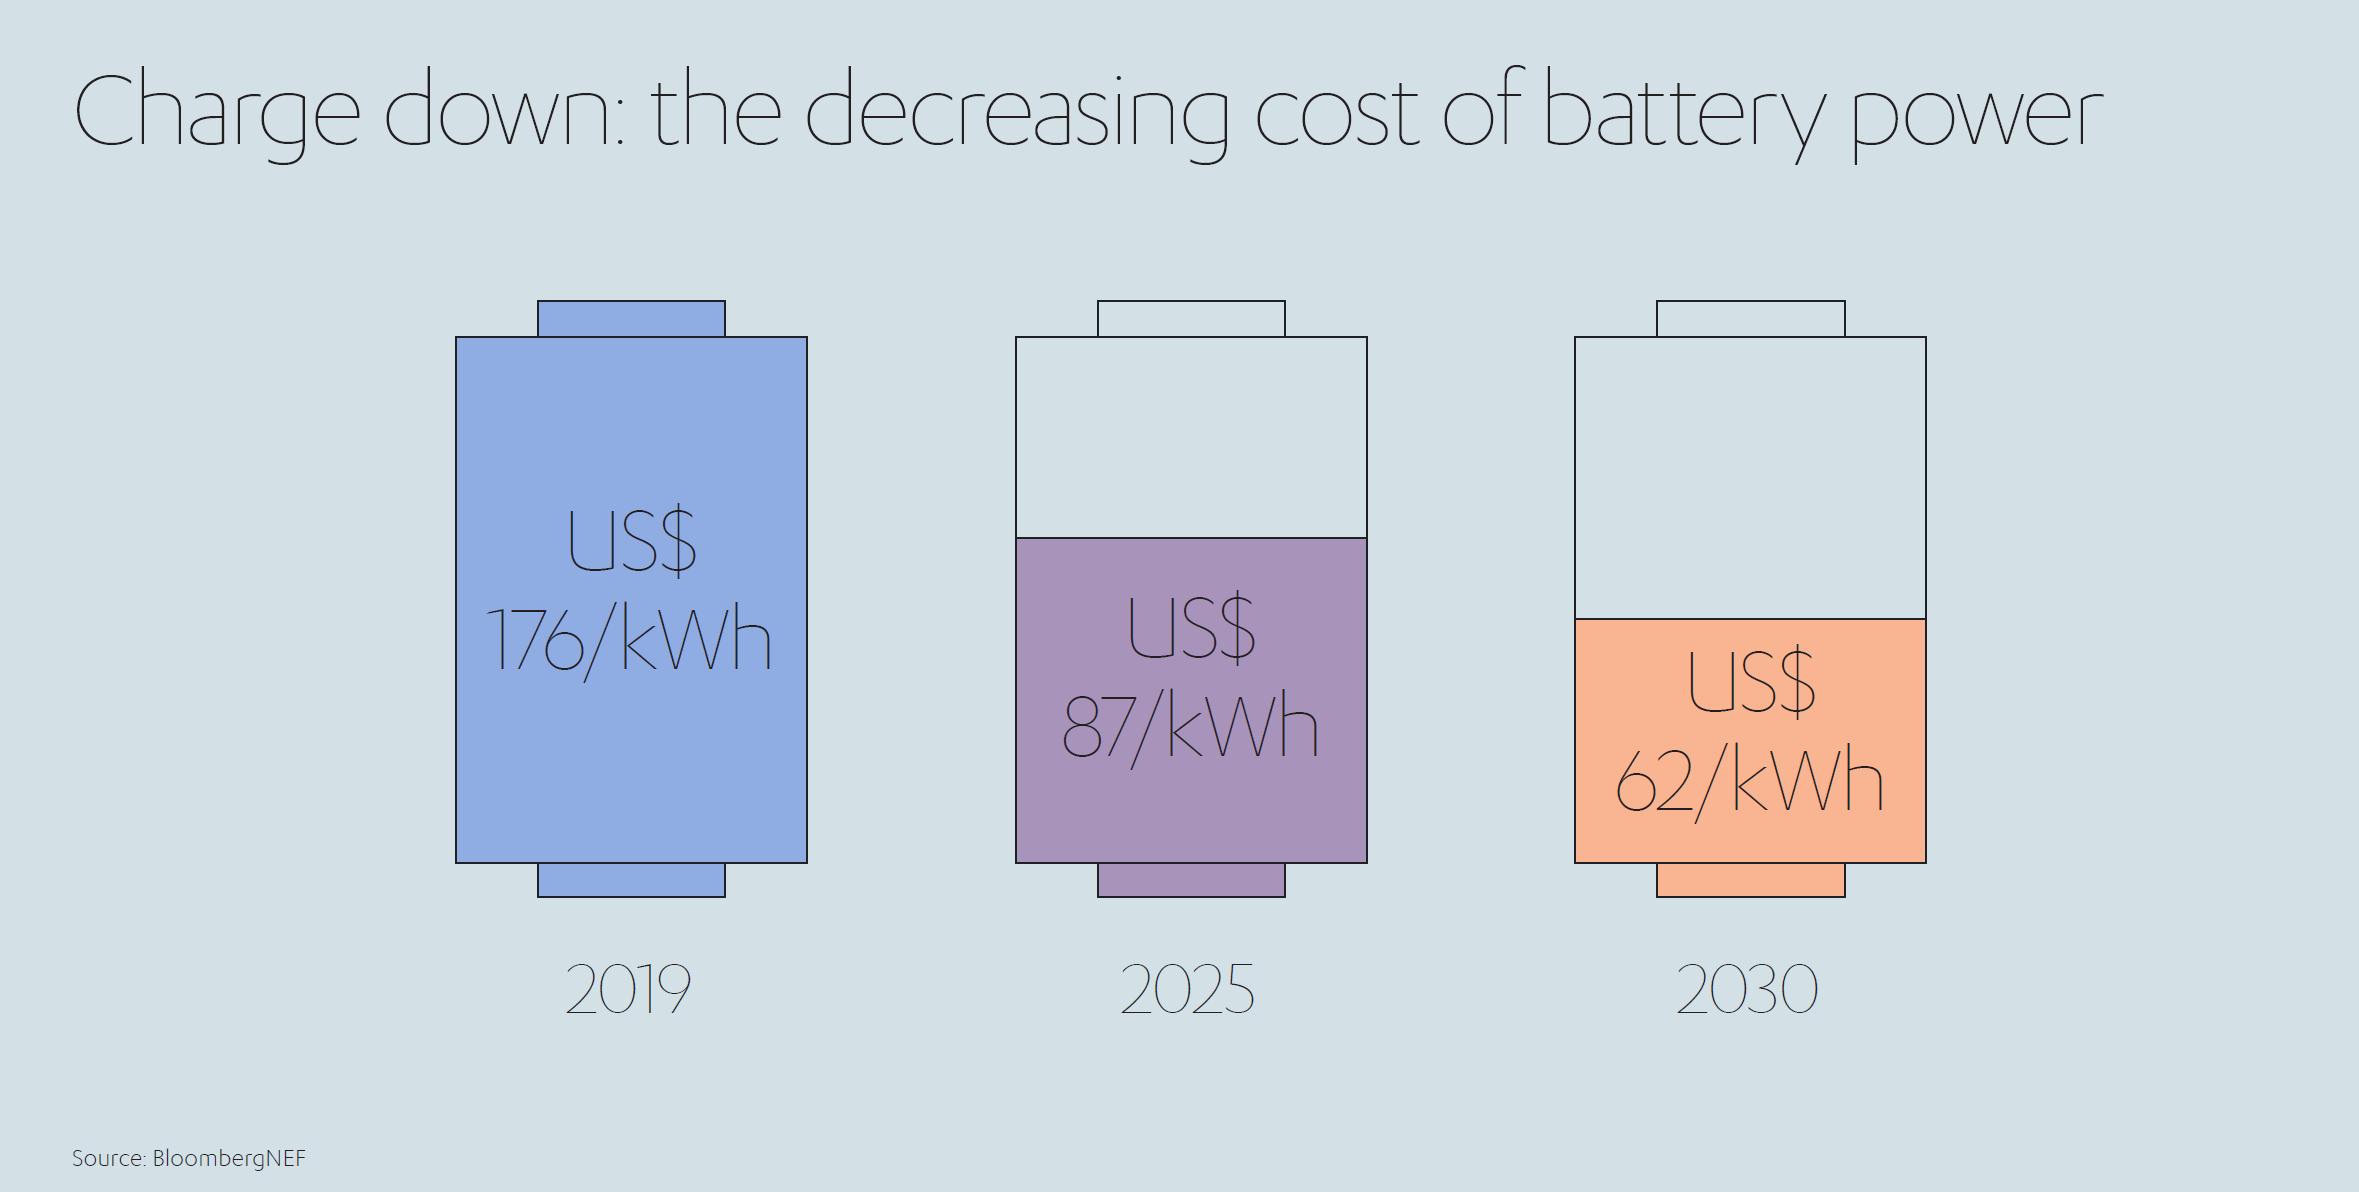 Decreasing Cost of Battery Power